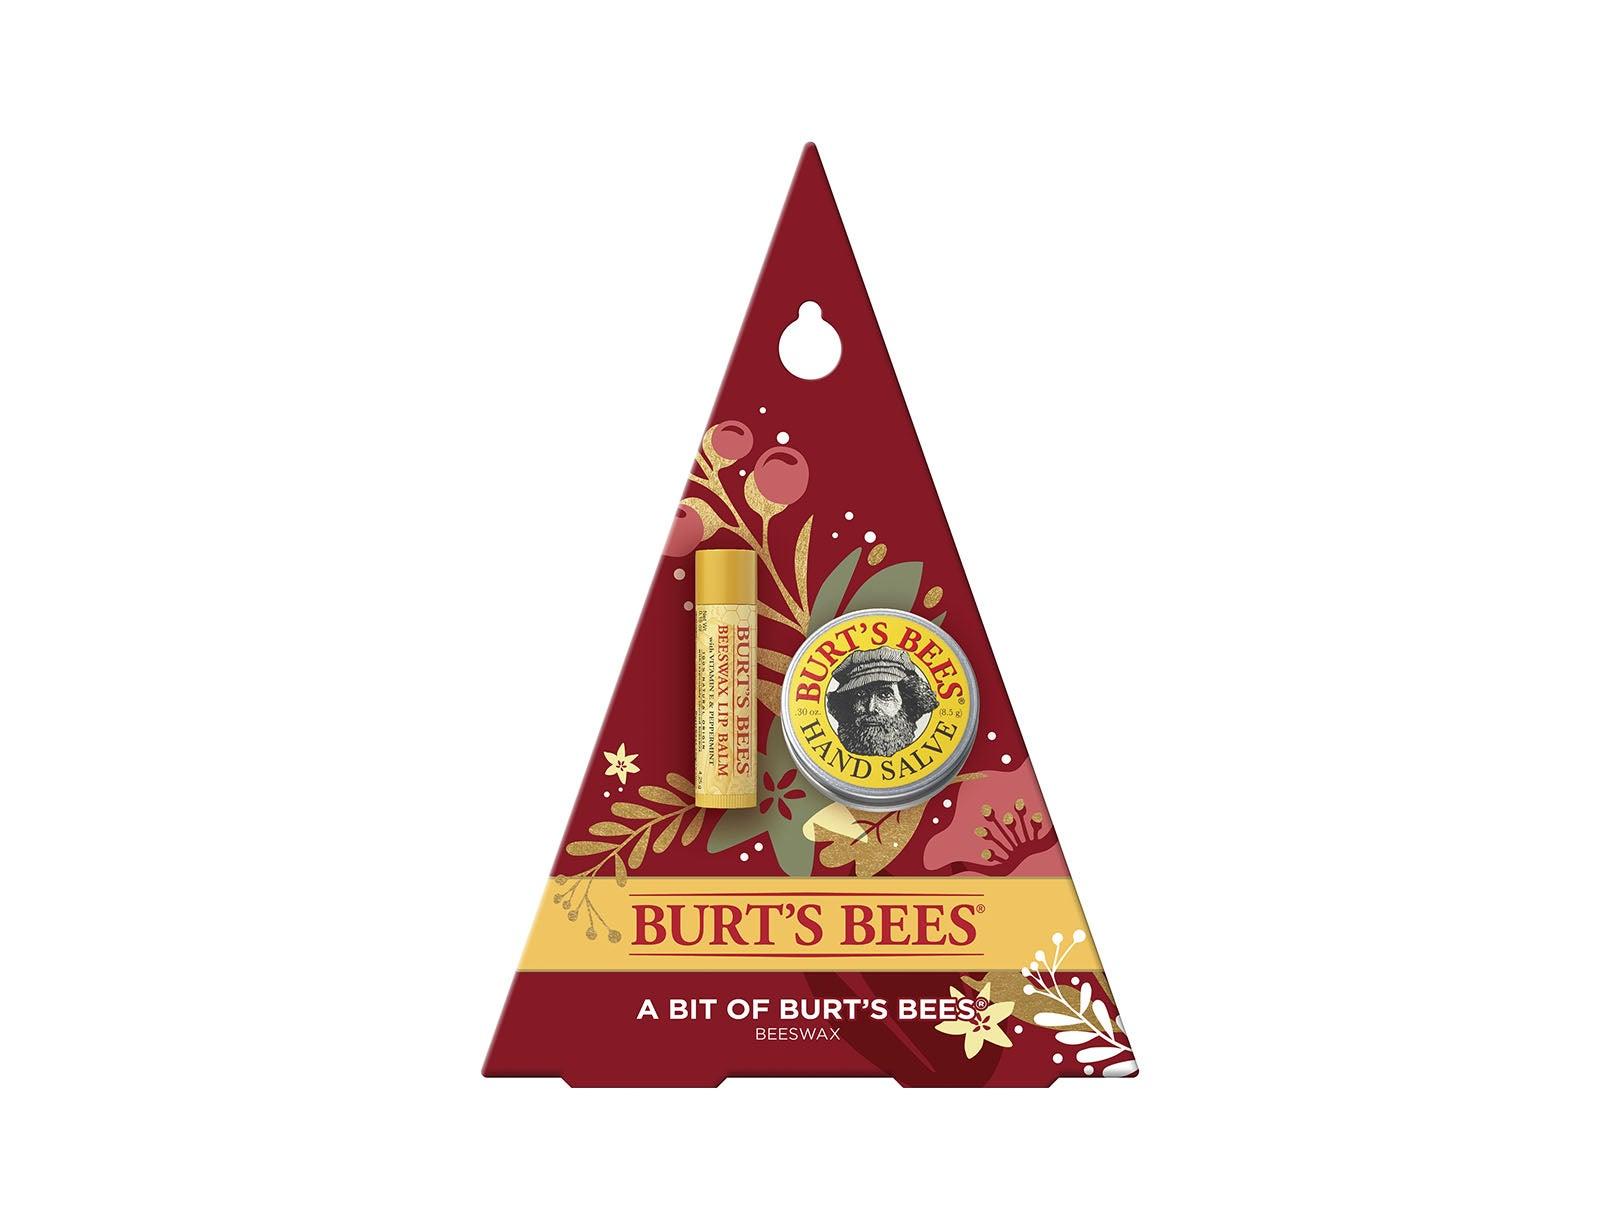 Burt's Bees A Bit of Burt's Beeswax Gift